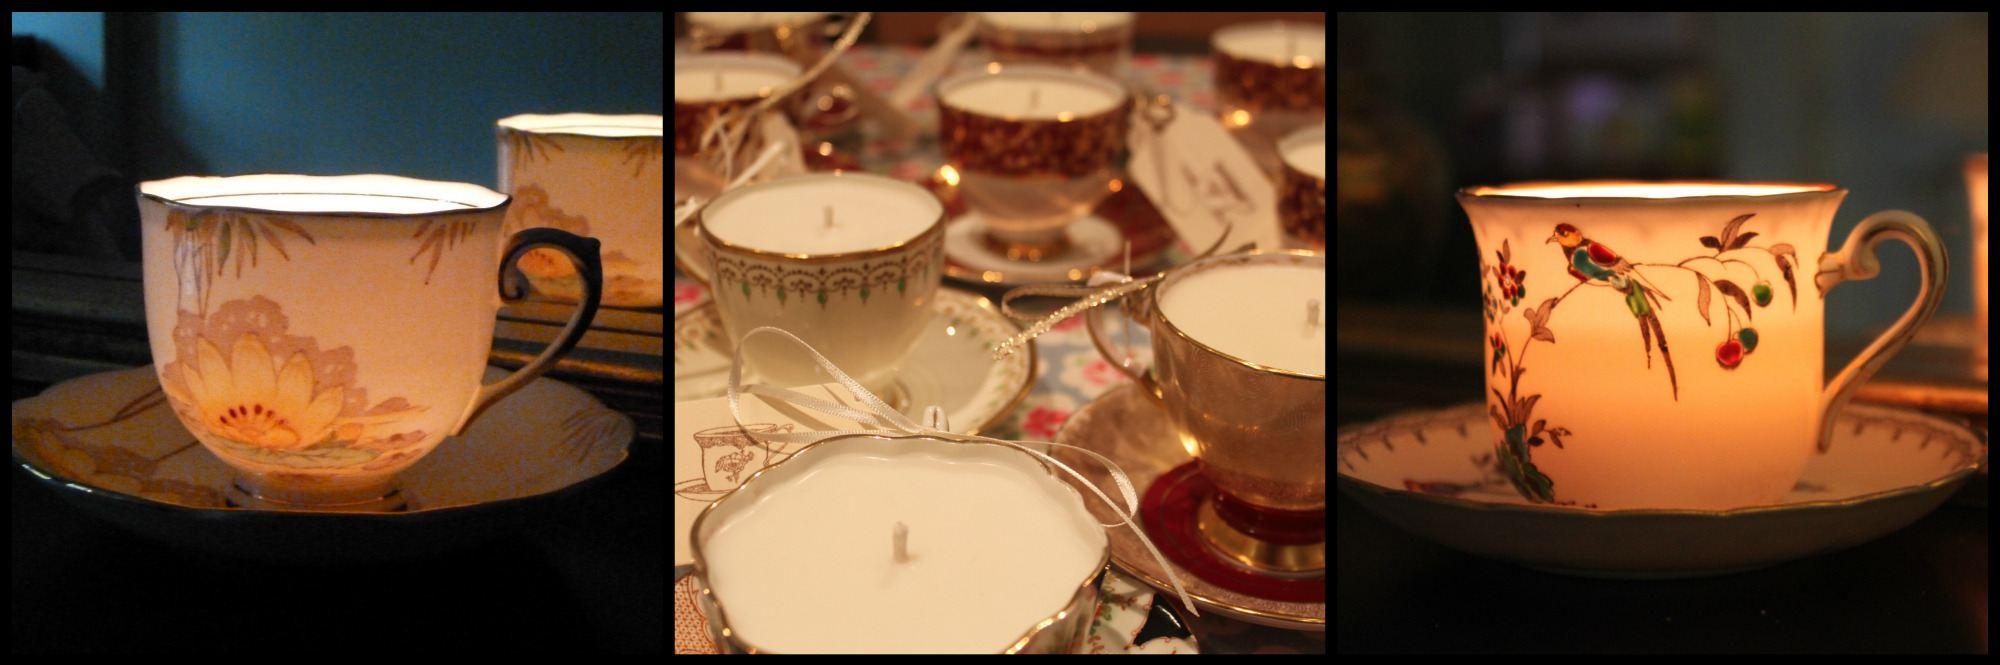 teacup candles christmas